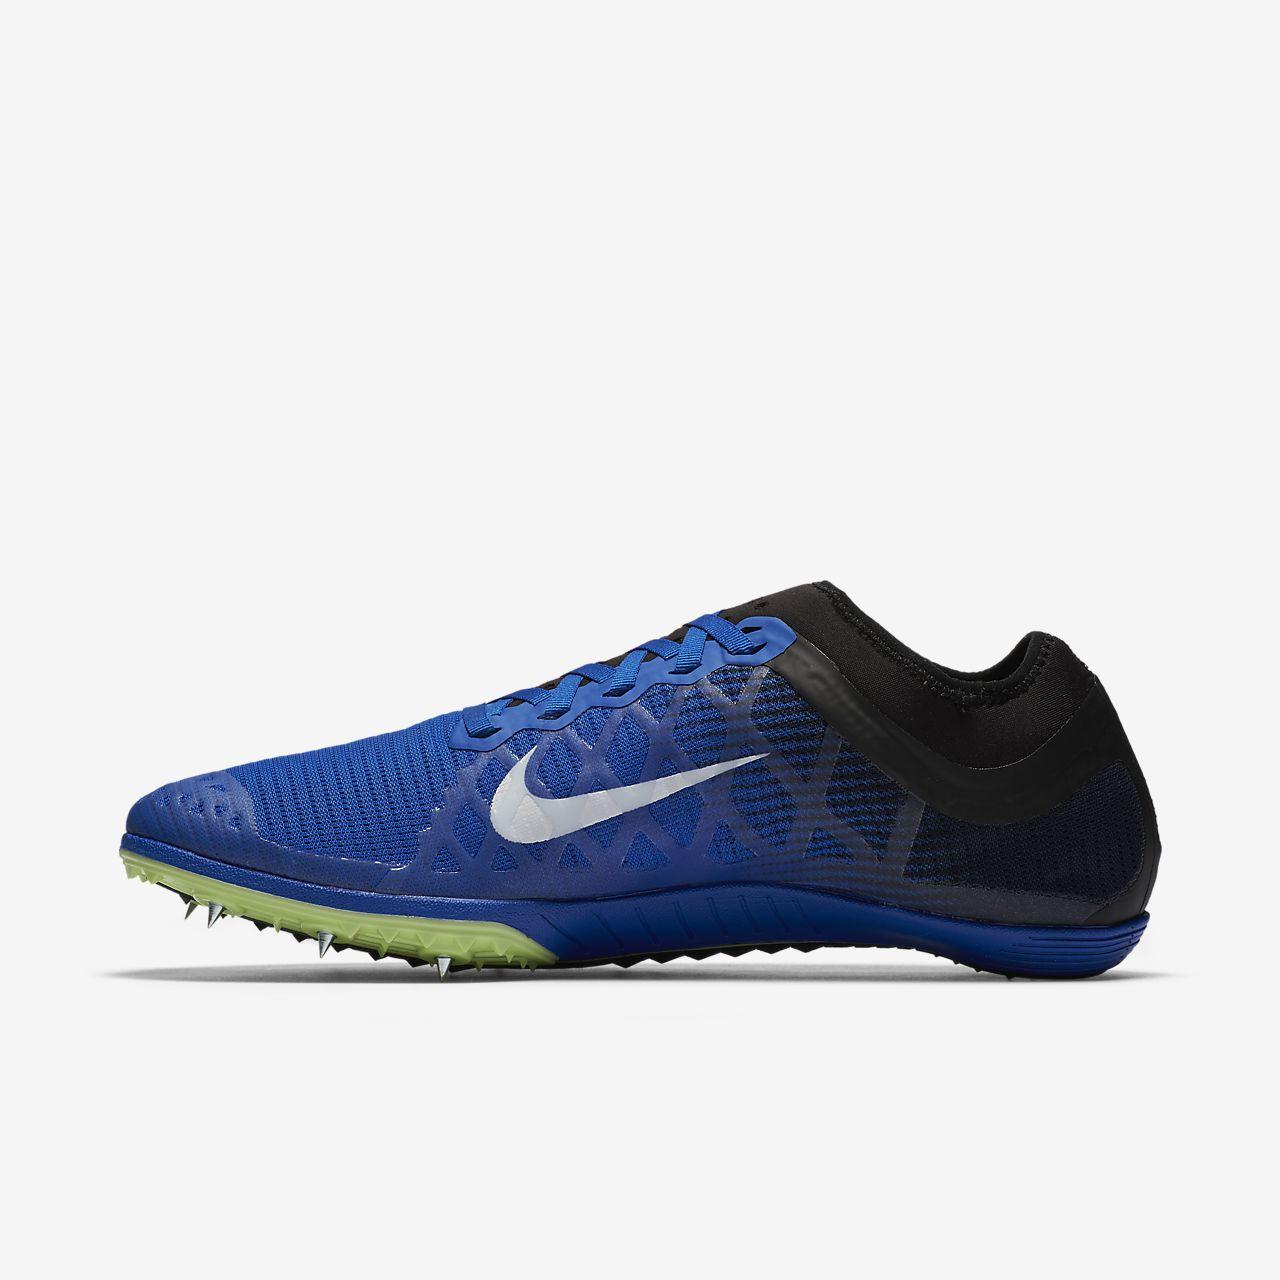 ... Nike Zoom Mamba 3 Unisex Distance Spike